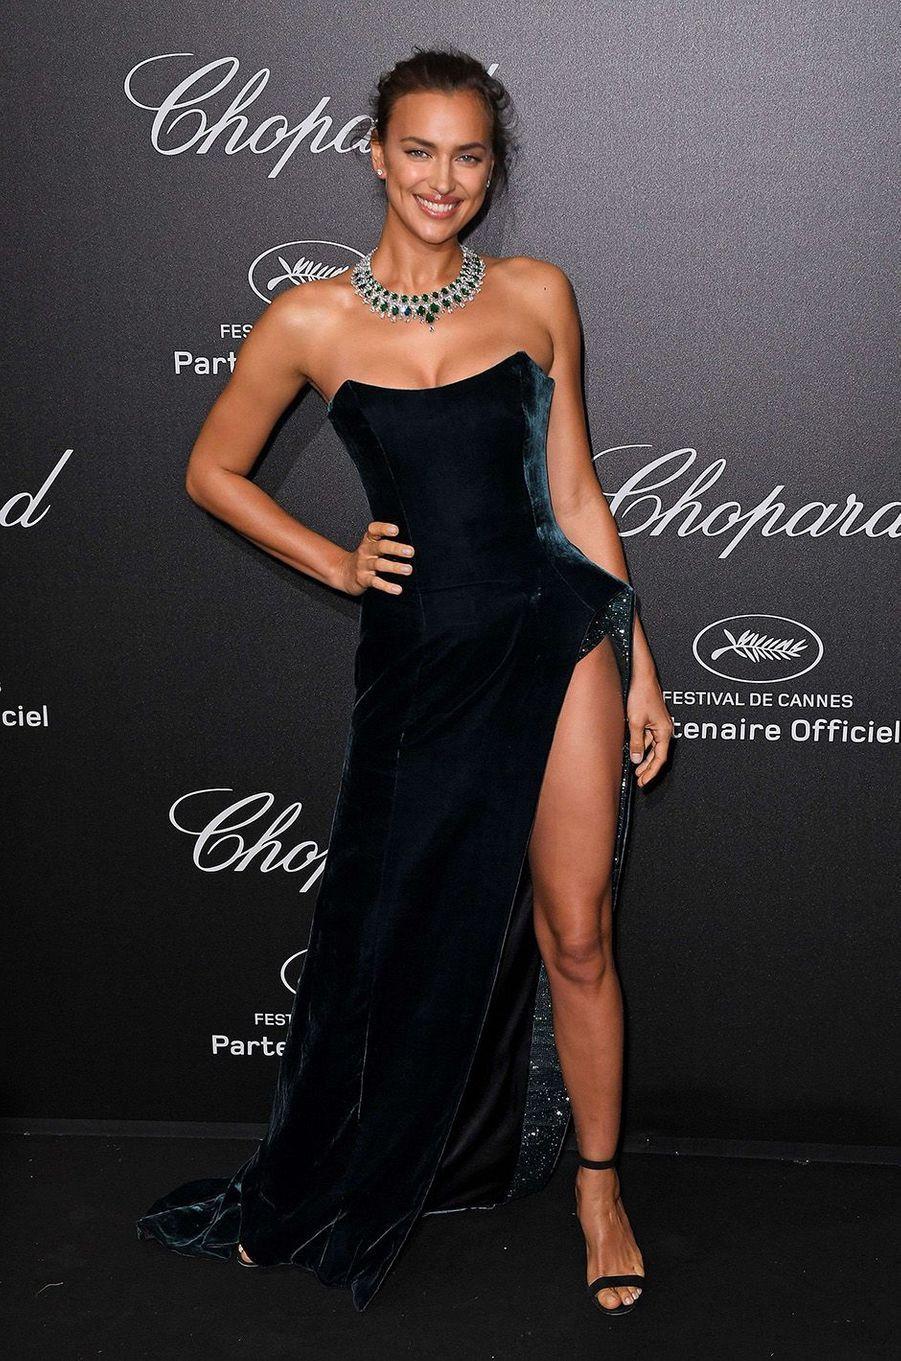 Irina Shayk à la soirée Chopard à Cannes, le 11 mai 2018.